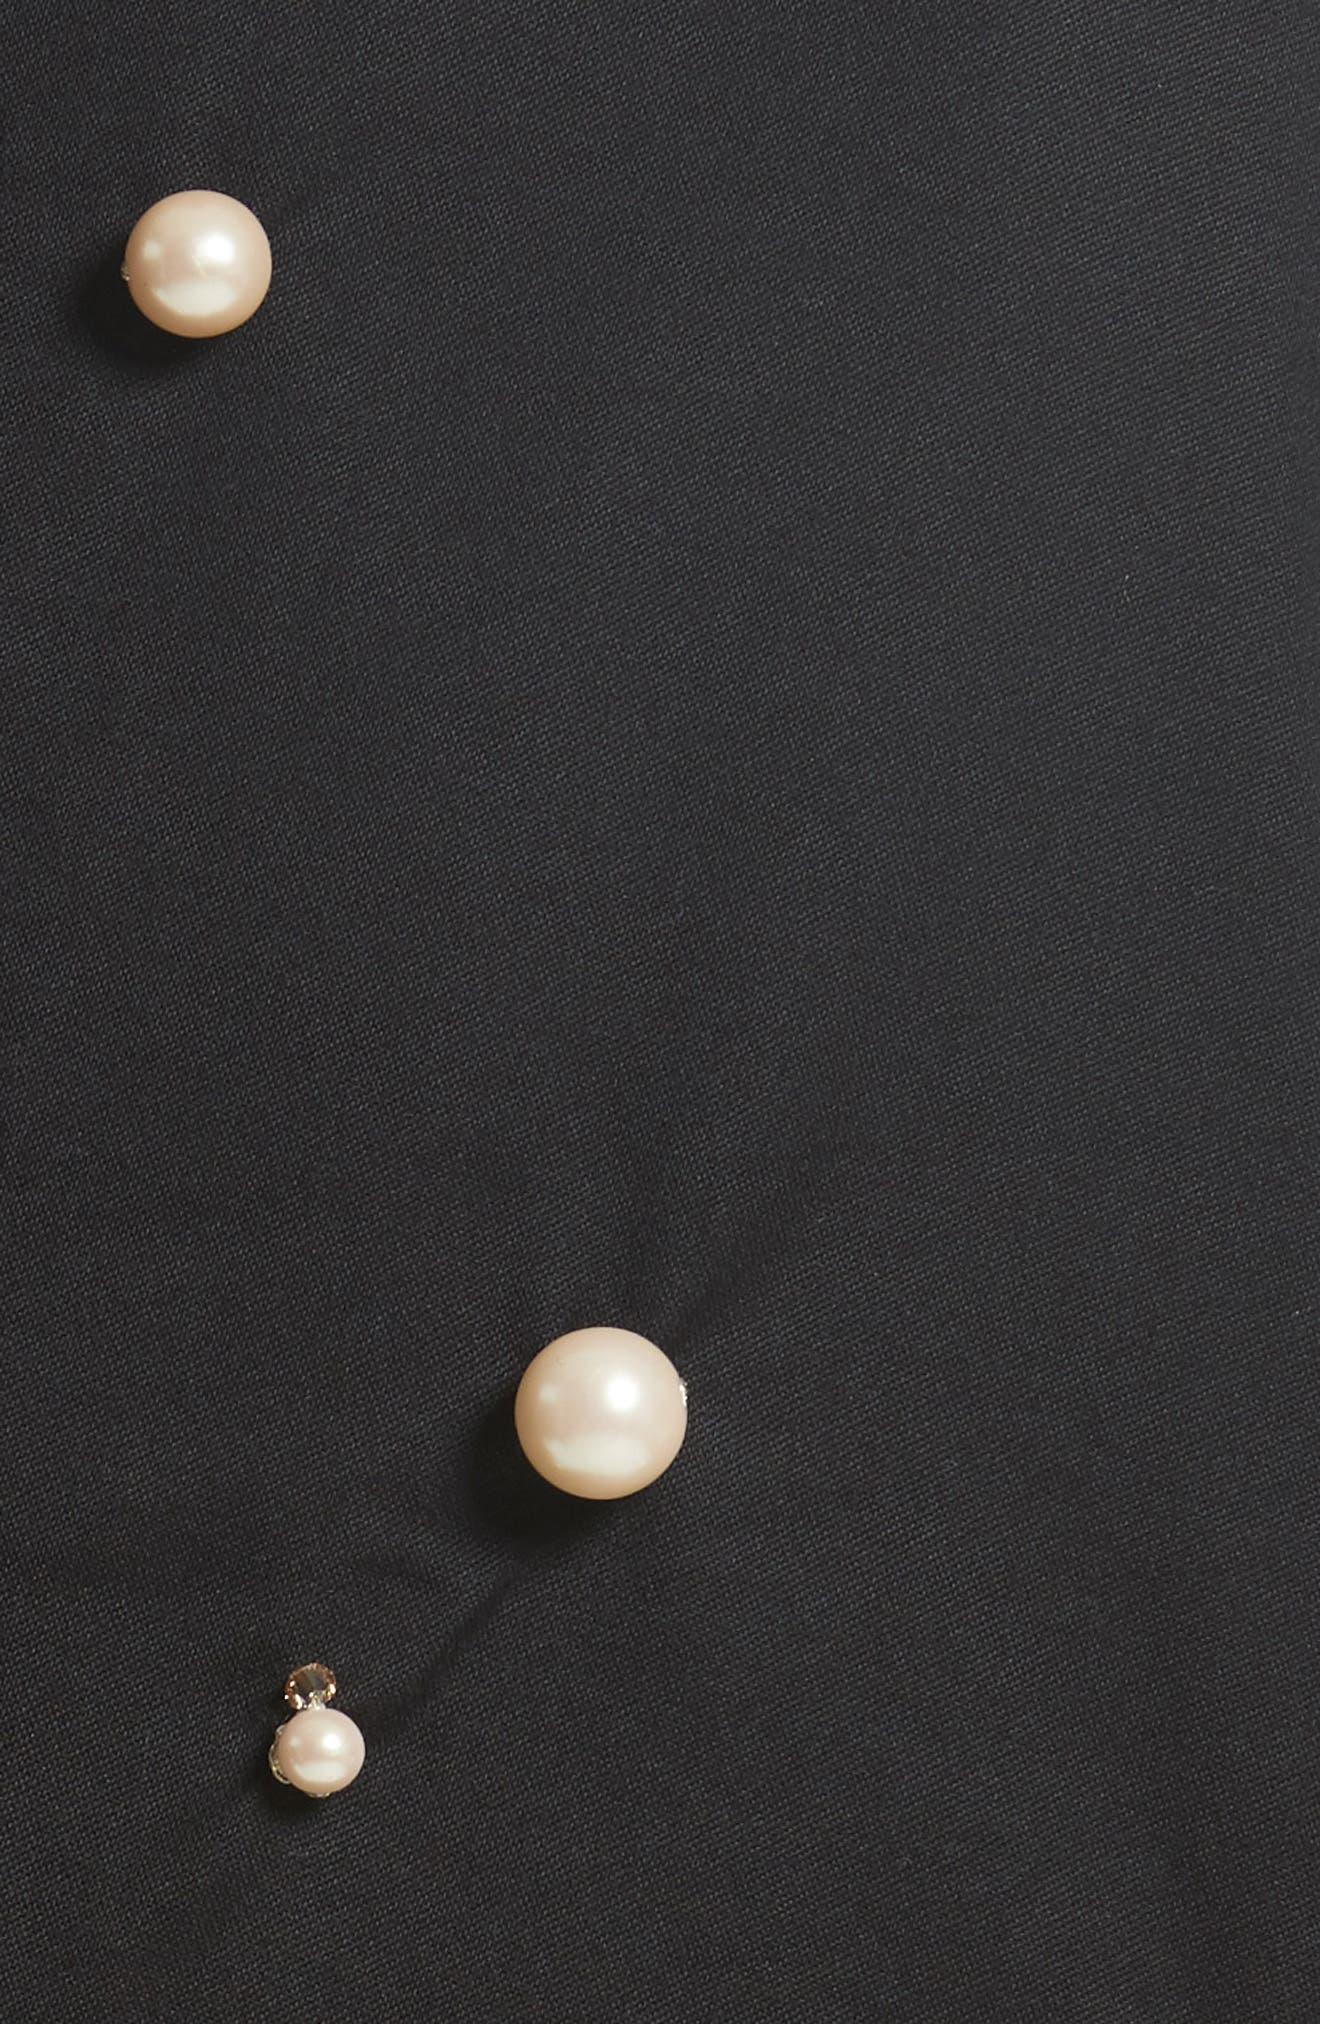 Snow Imitation Pearl Embellished Field Jacket,                             Alternate thumbnail 5, color,                             001